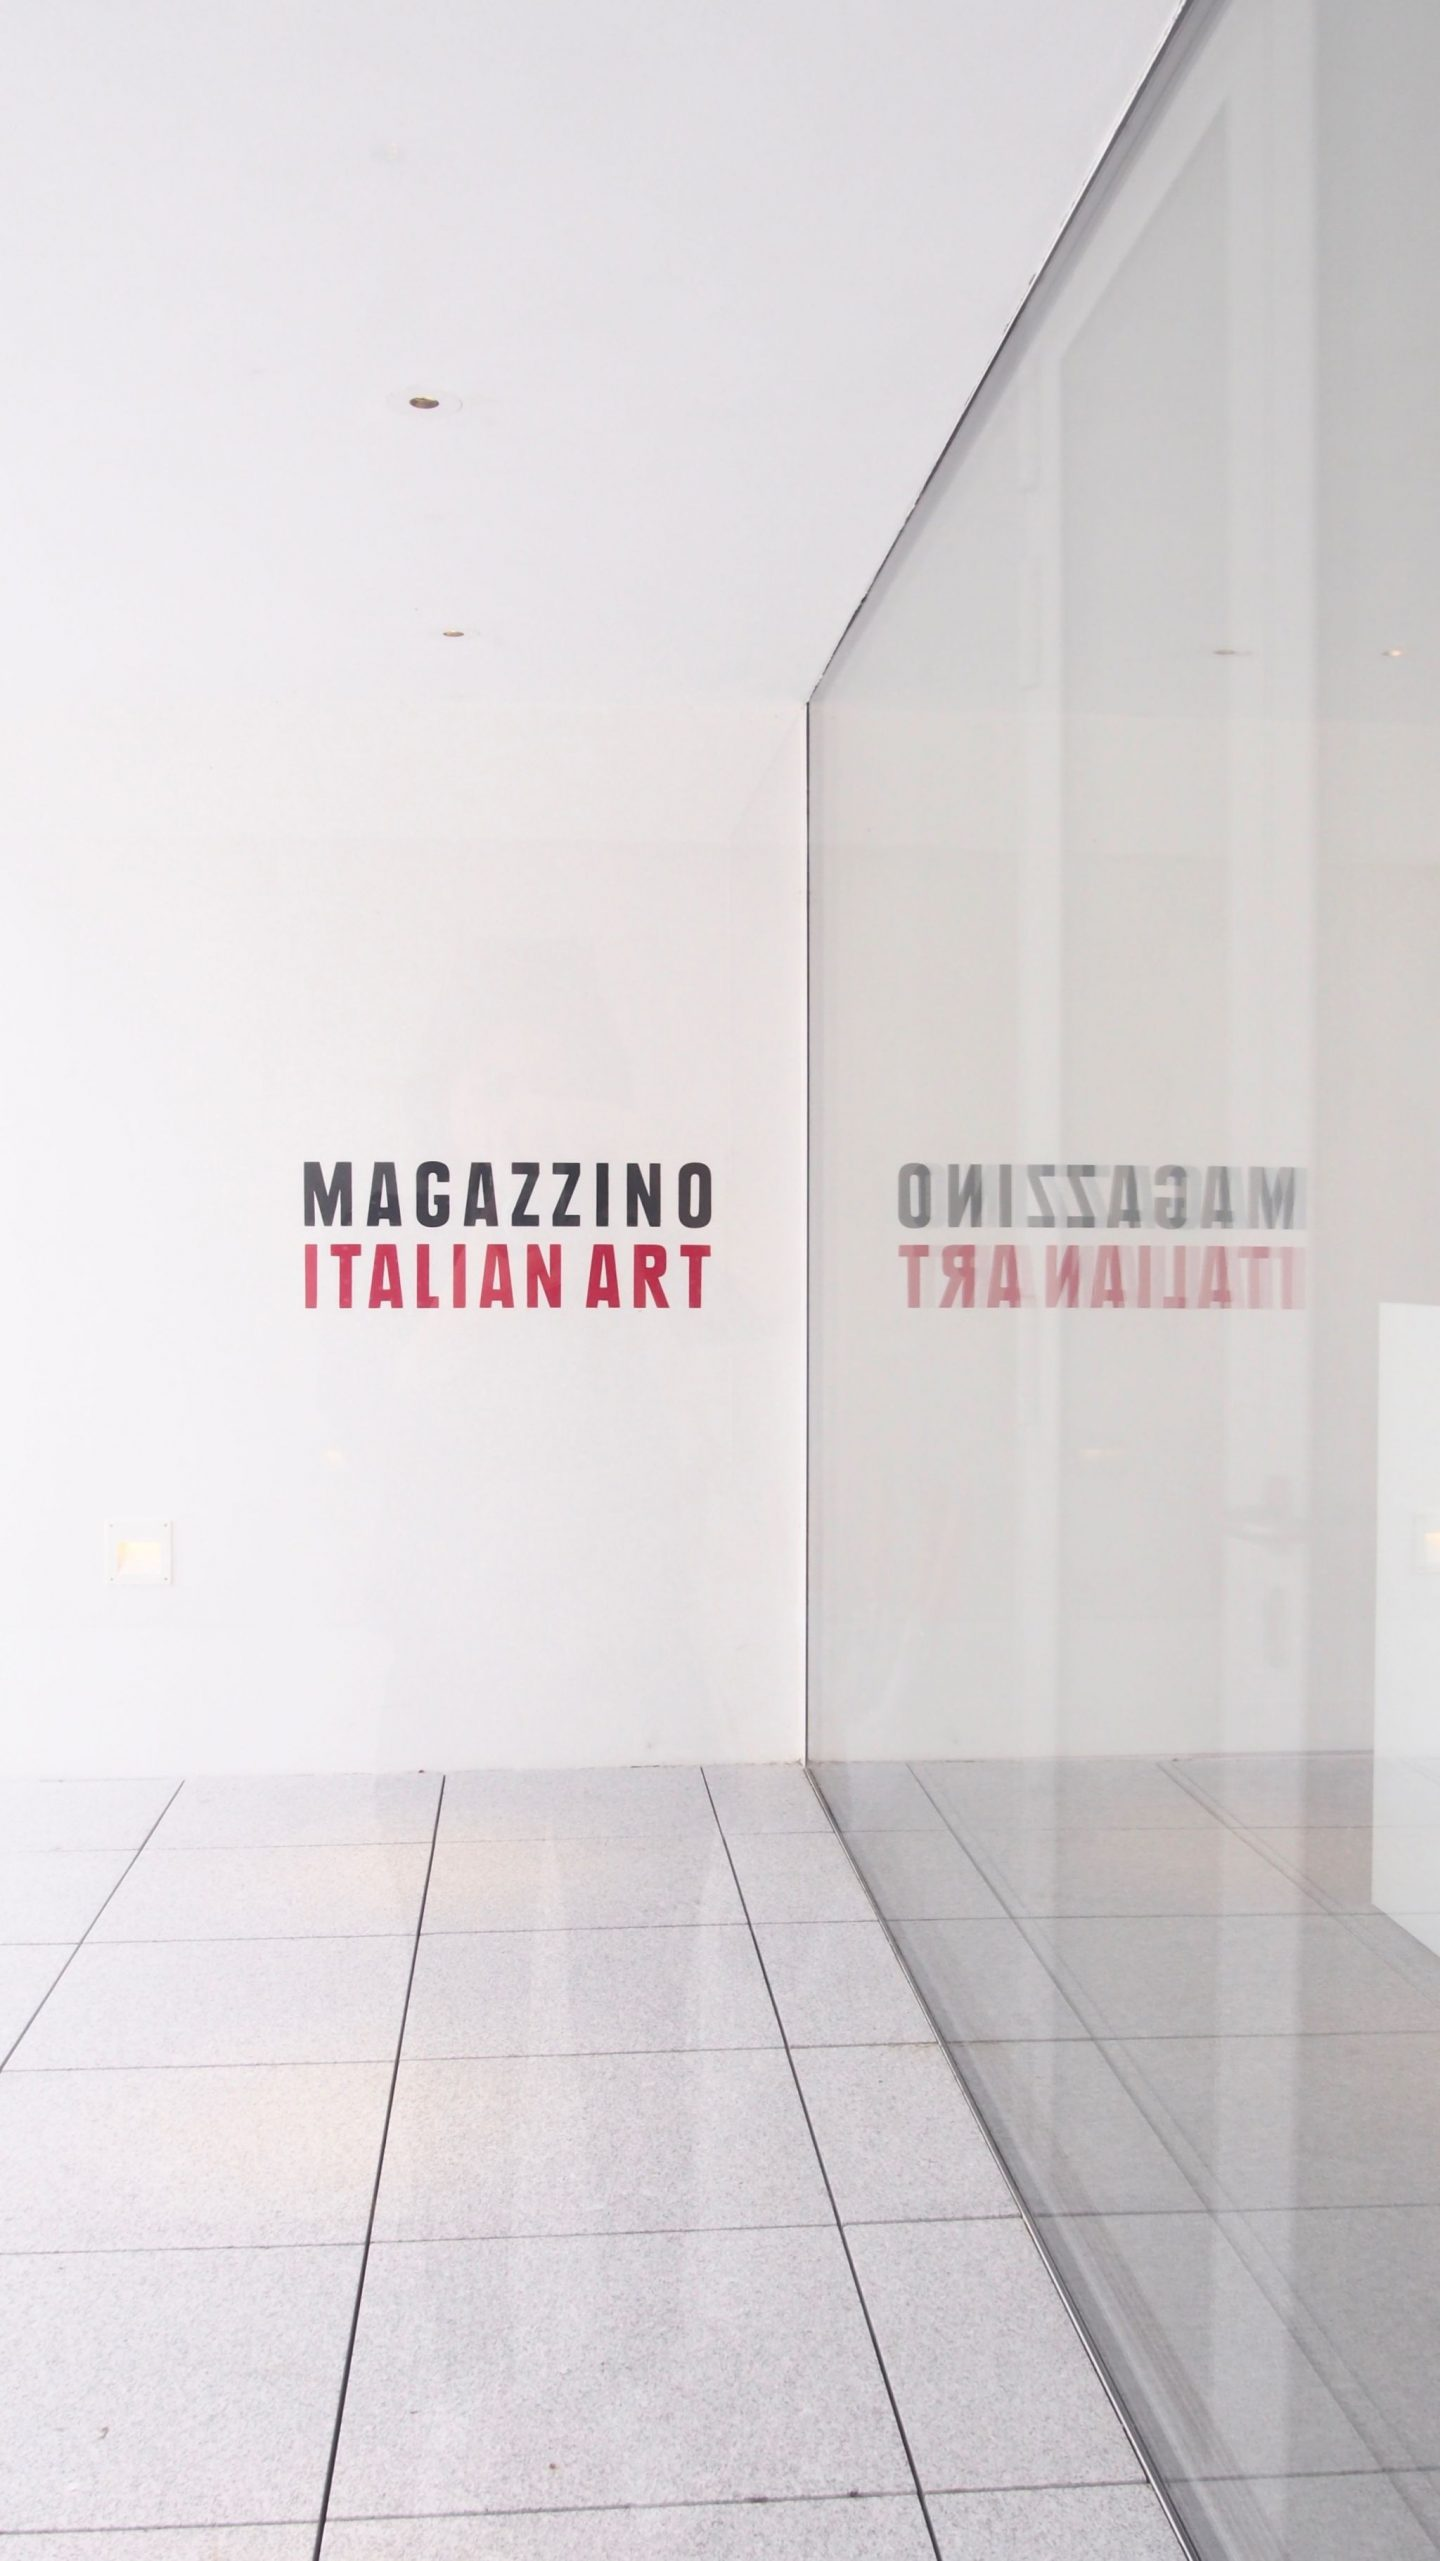 magazzino italian art